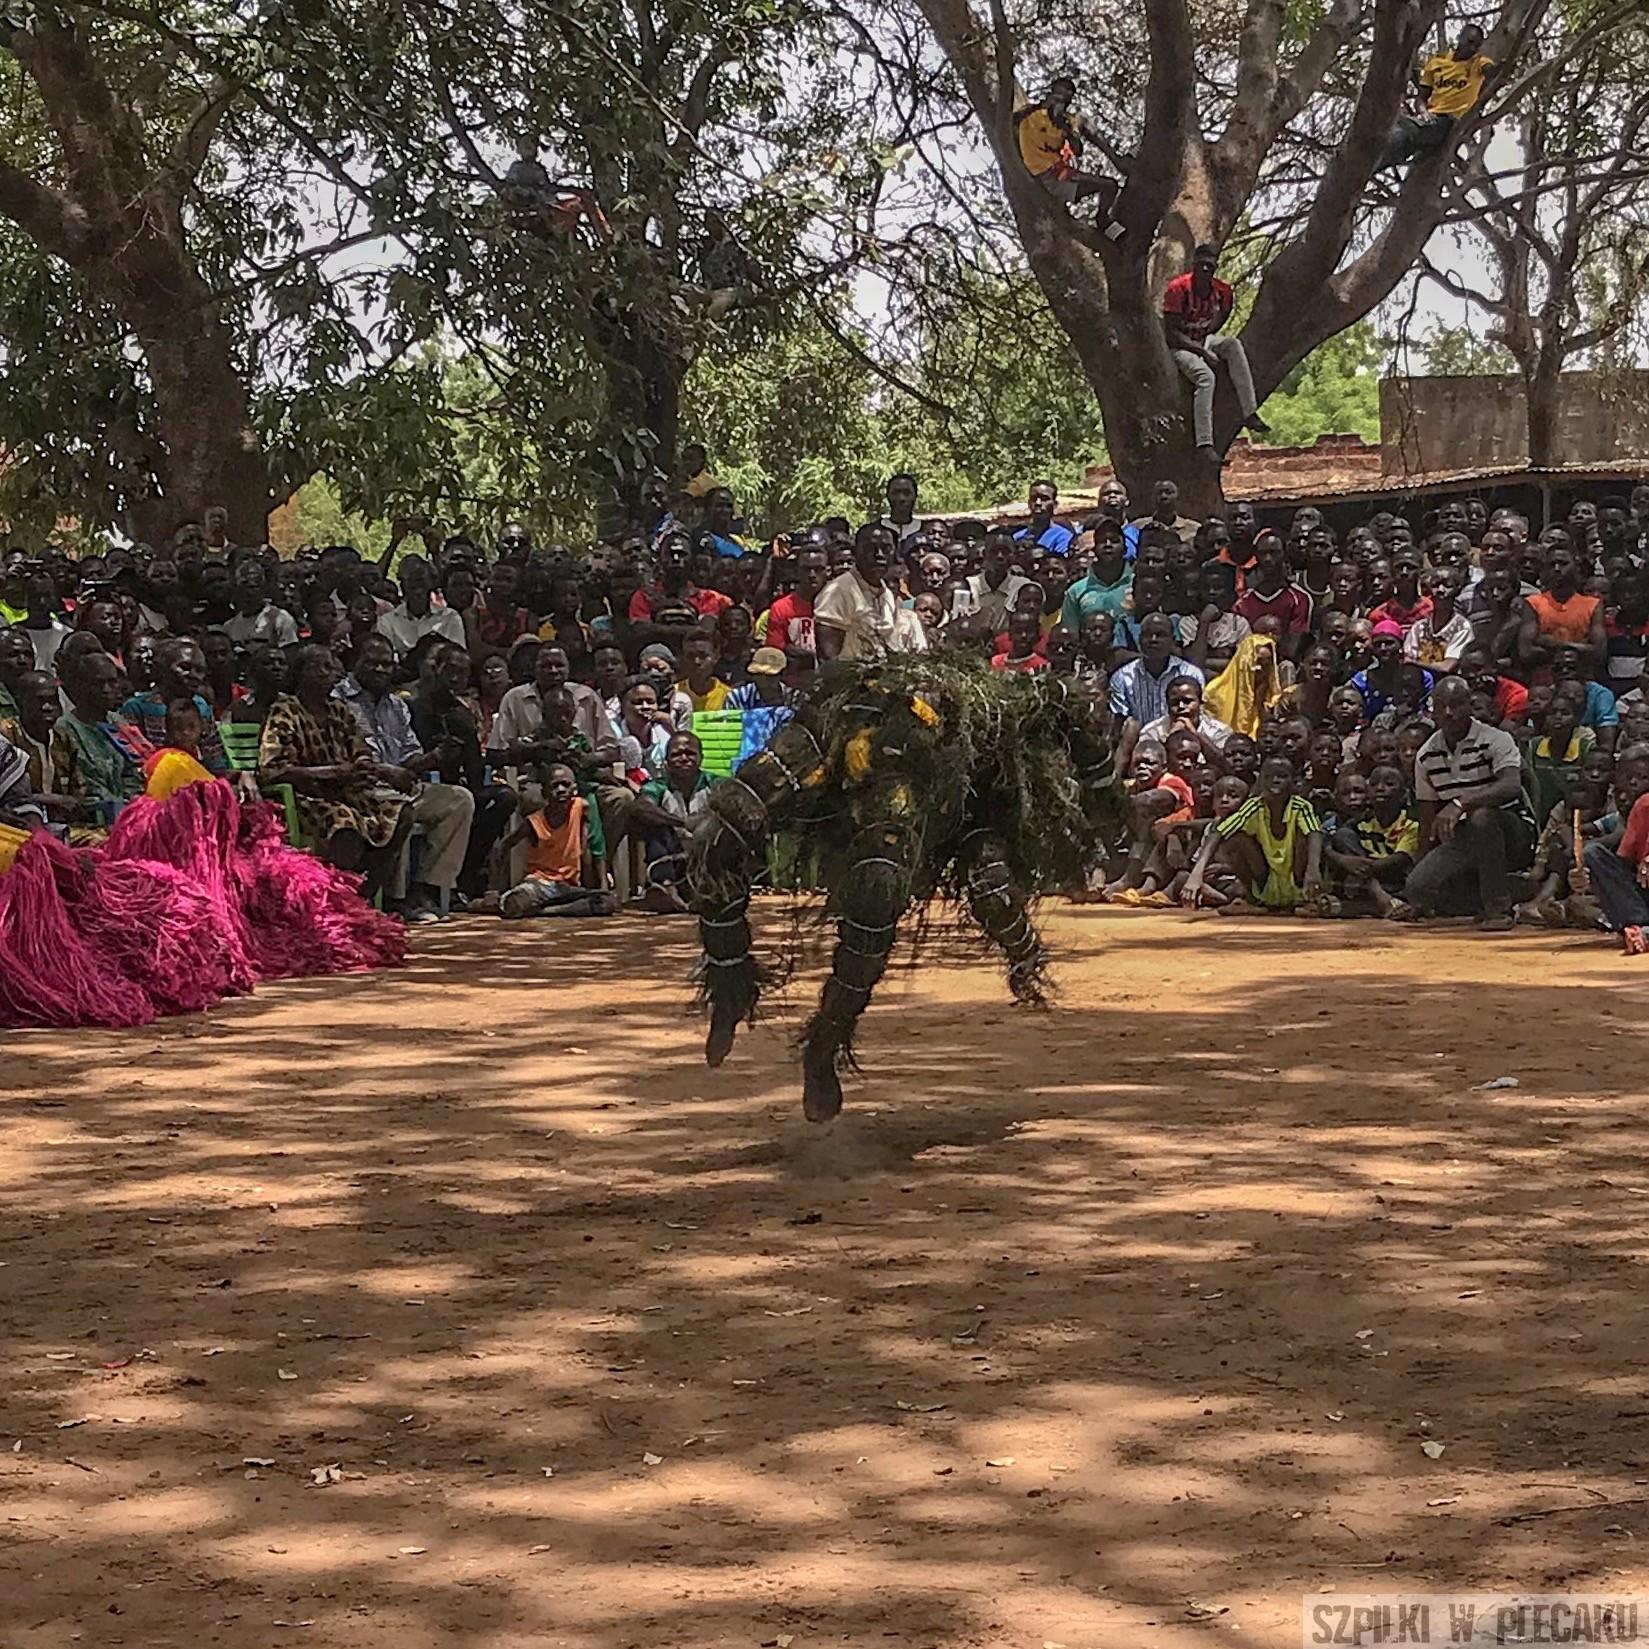 mascarade festiwal - Dogona - Burkina Faso